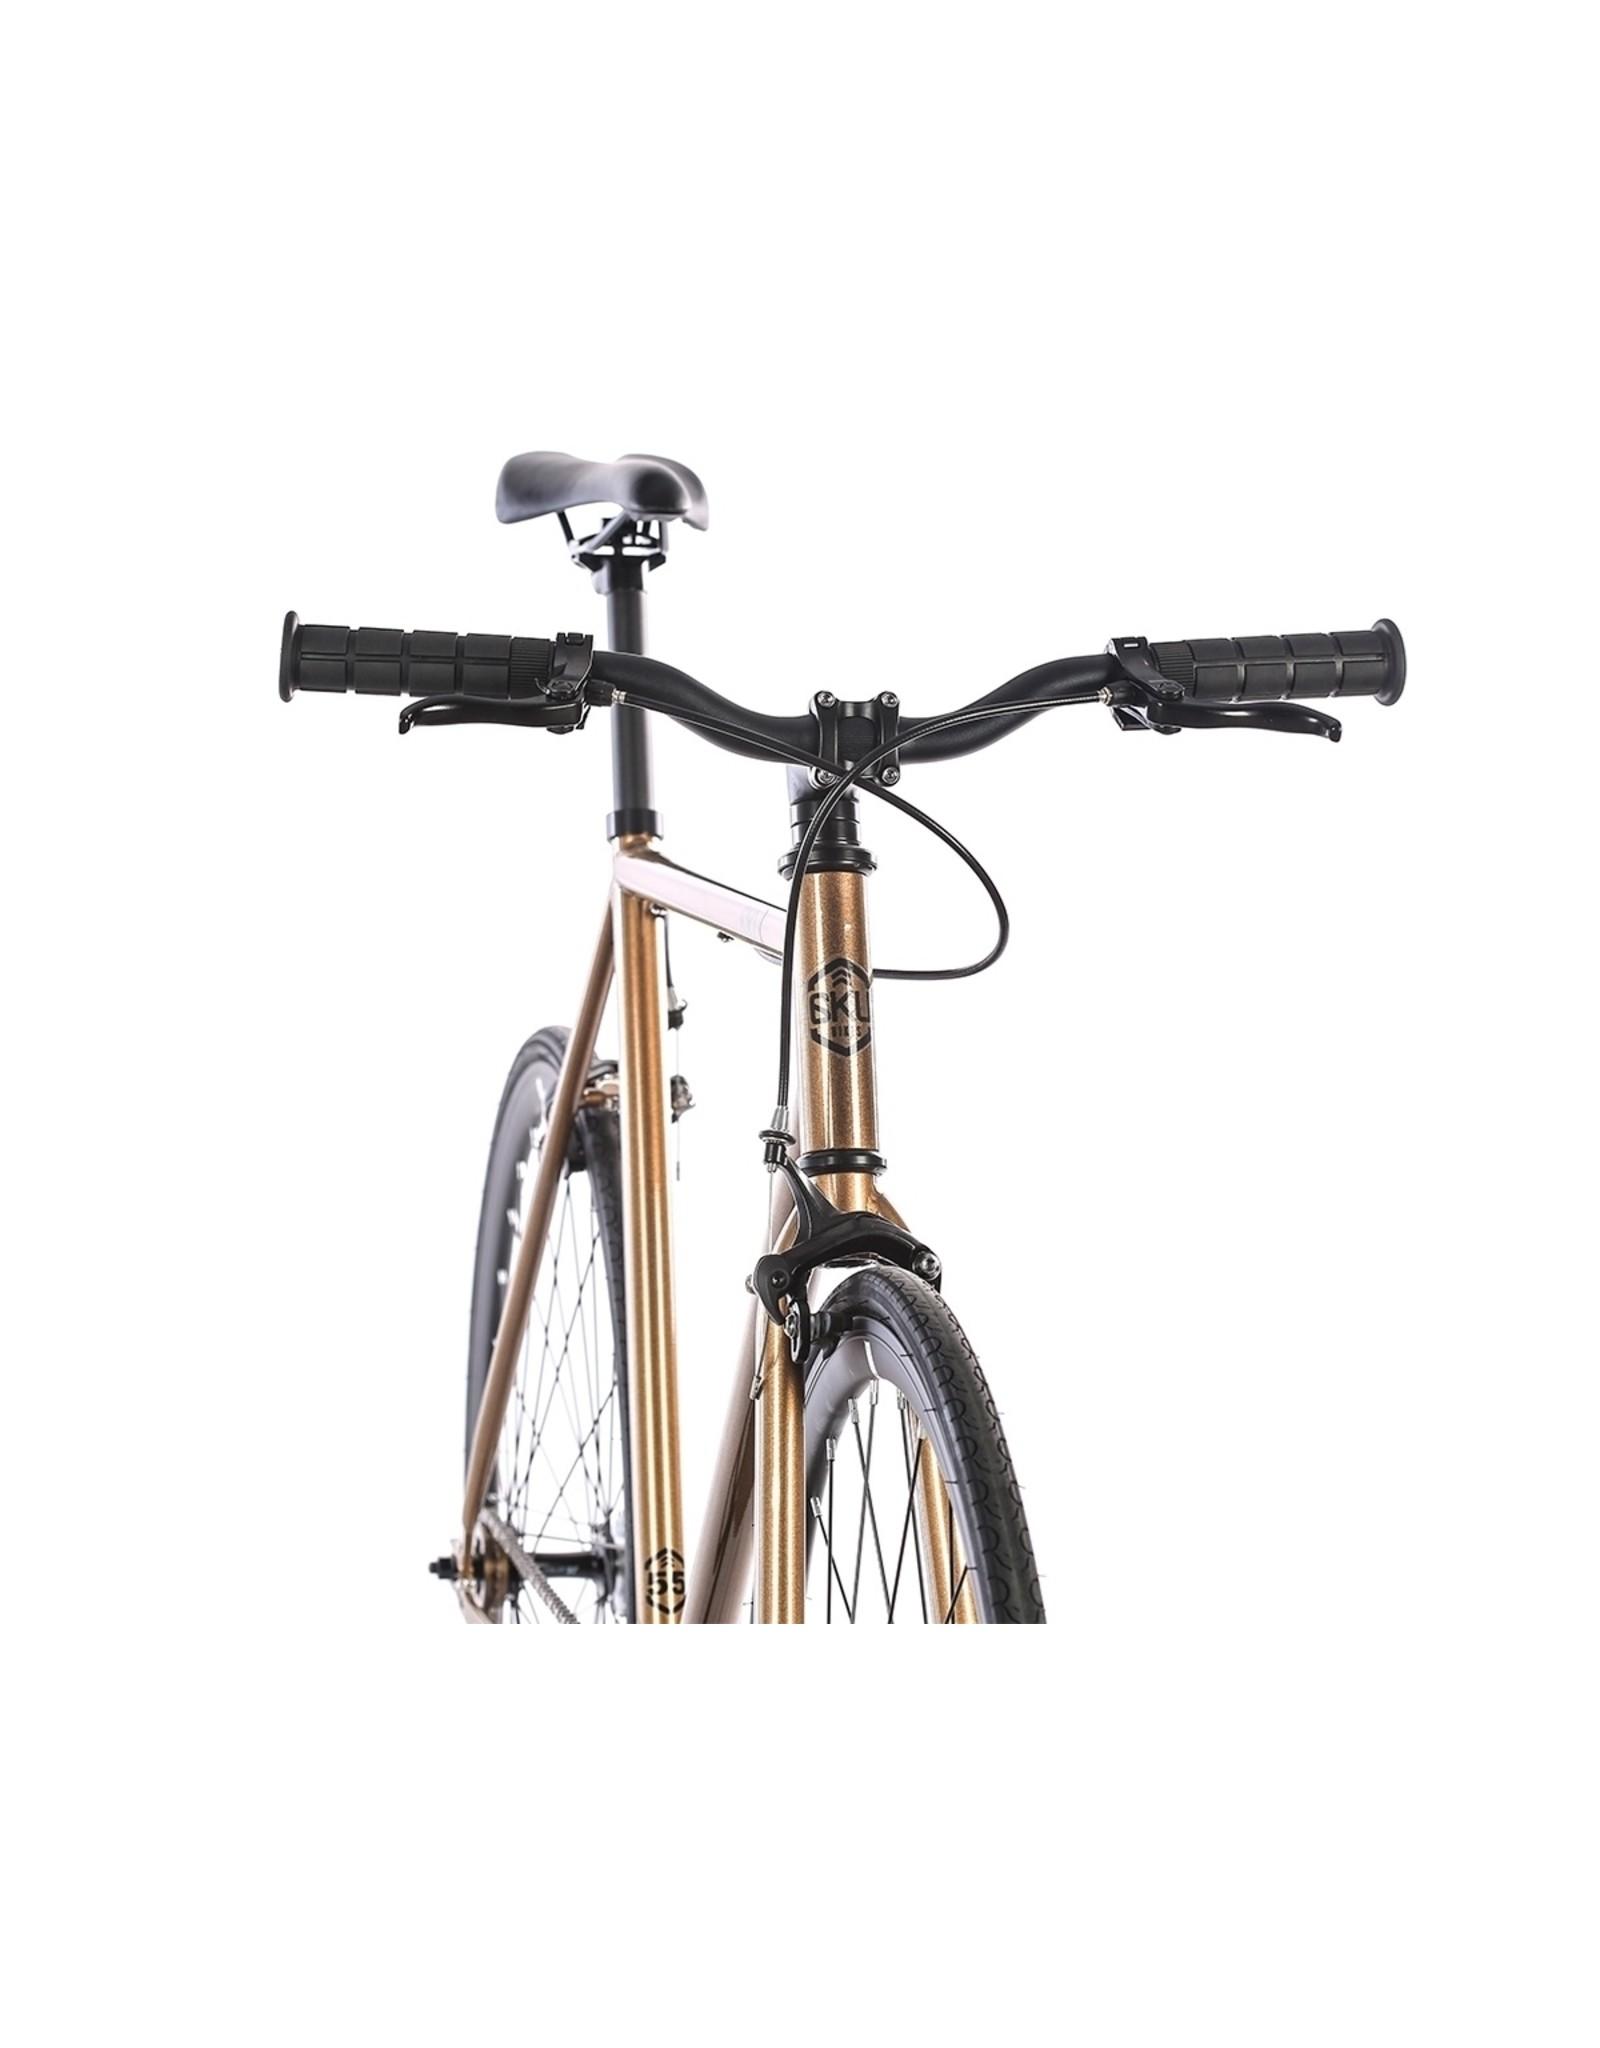 2018 6KU Fixie & Single Speed Bike - Dallas Size:49cm brown / black wheels